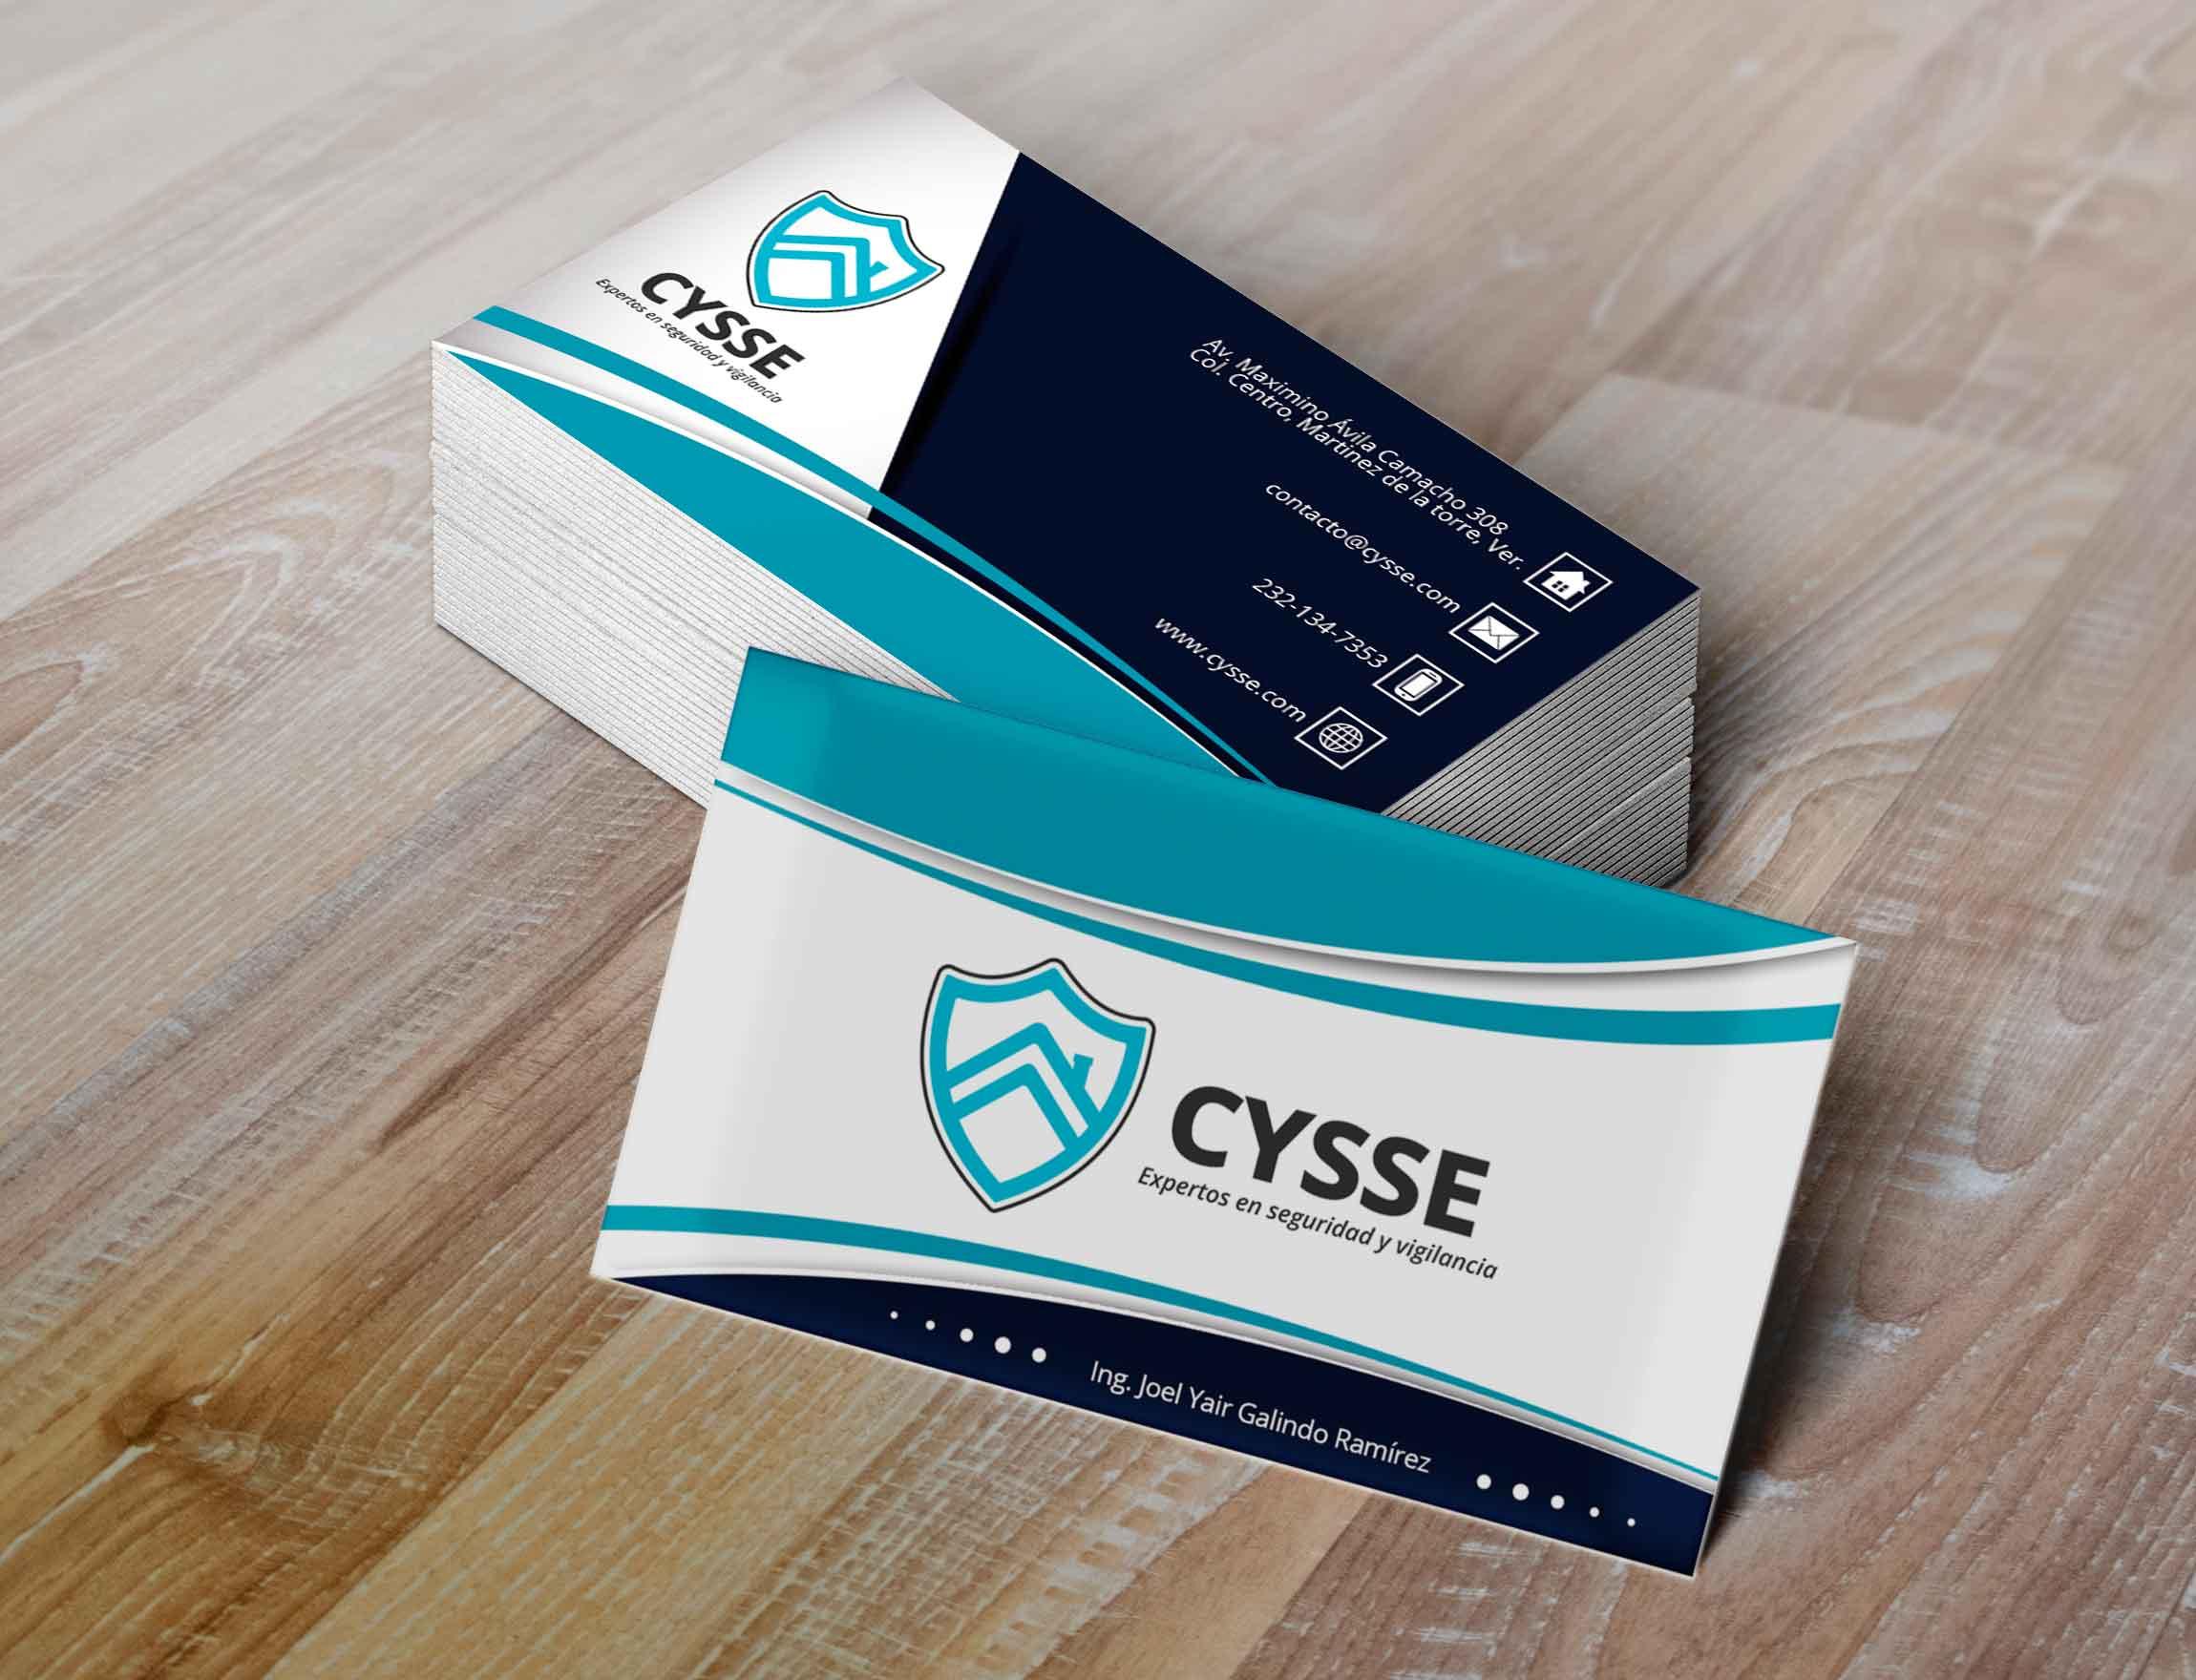 Tarjetas Cysse